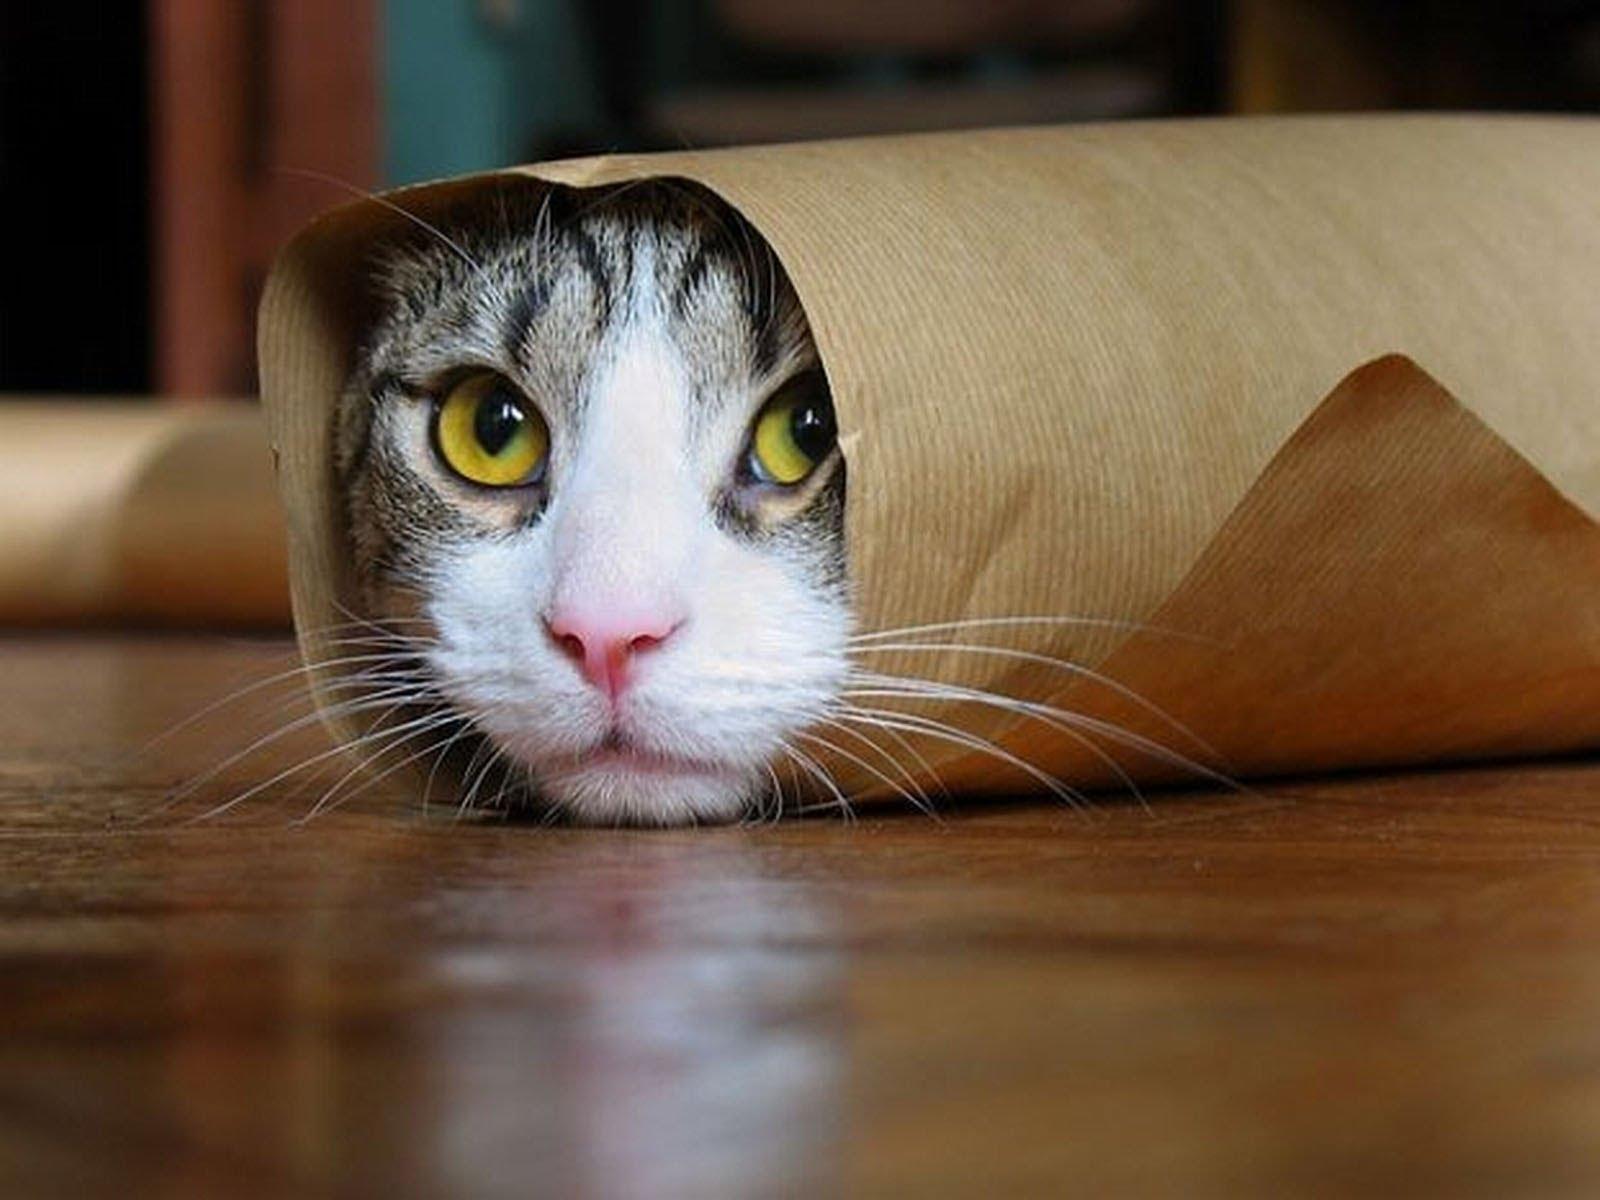 Beautiful cat photo